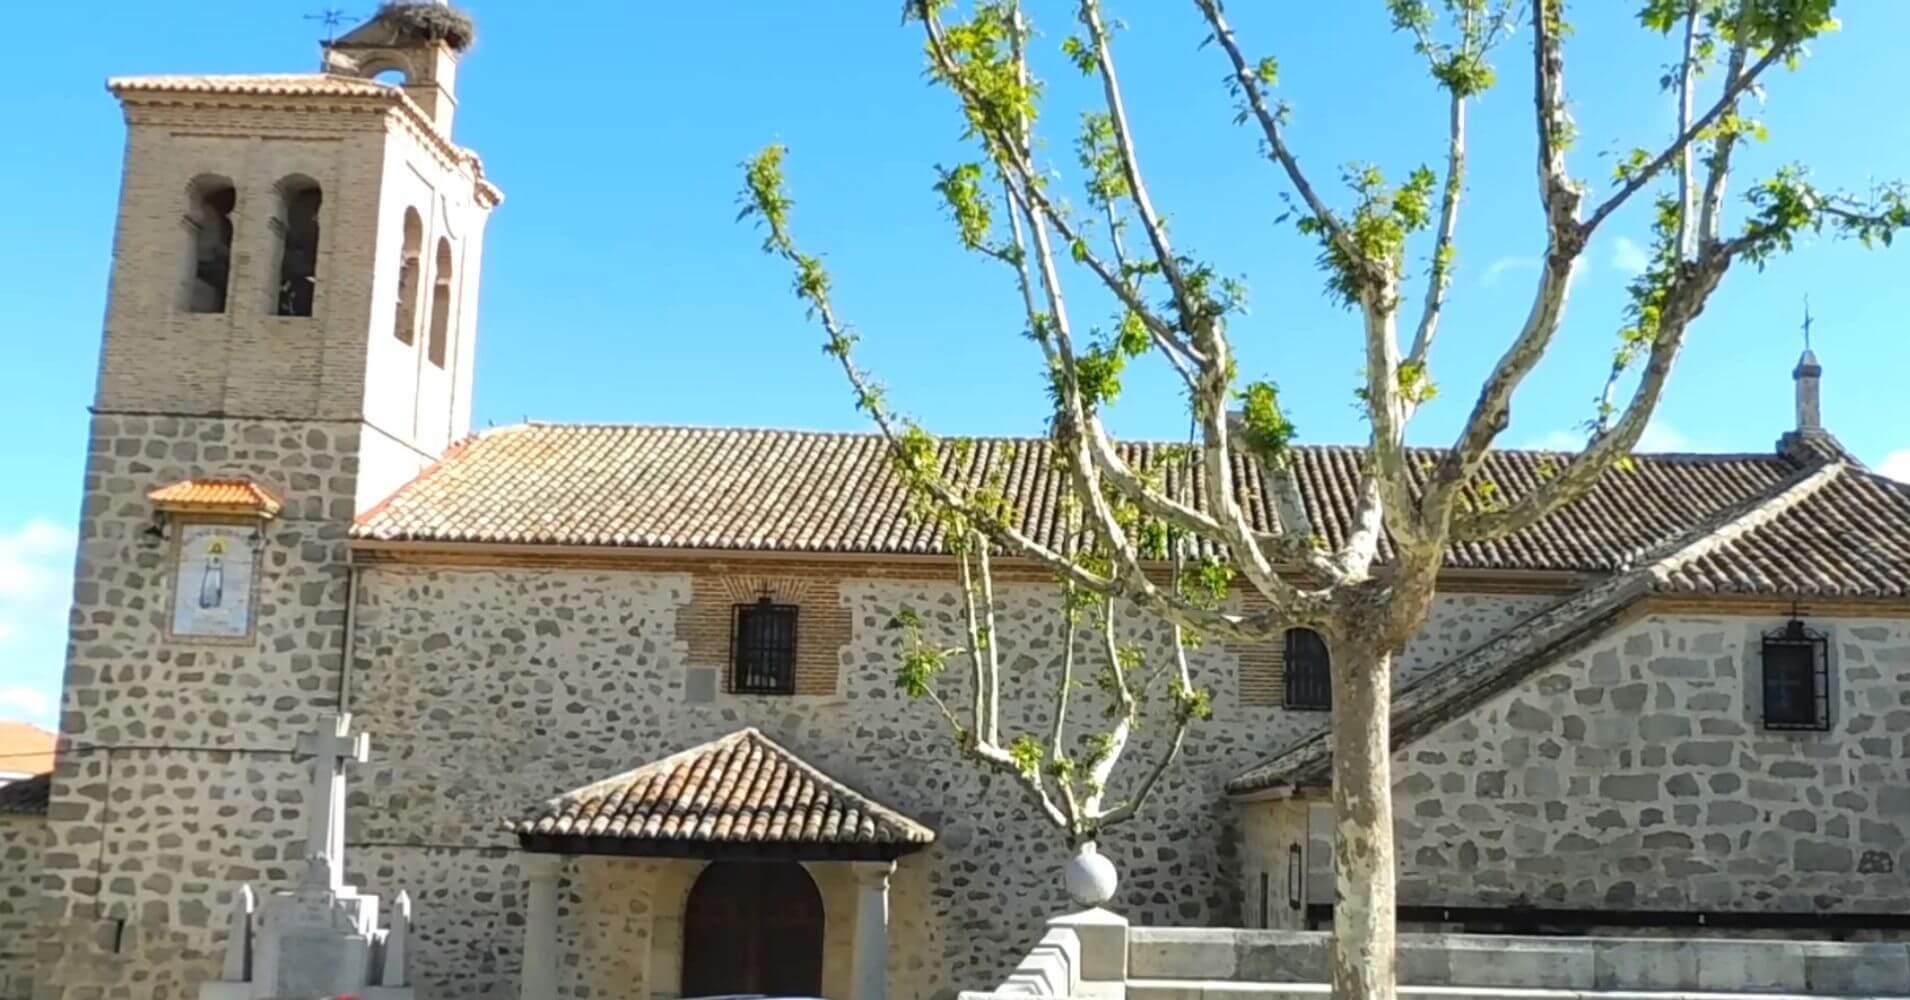 Iglesia Parroquial de San Pablo de los Montes. Toledo. Castilla la Mancha.